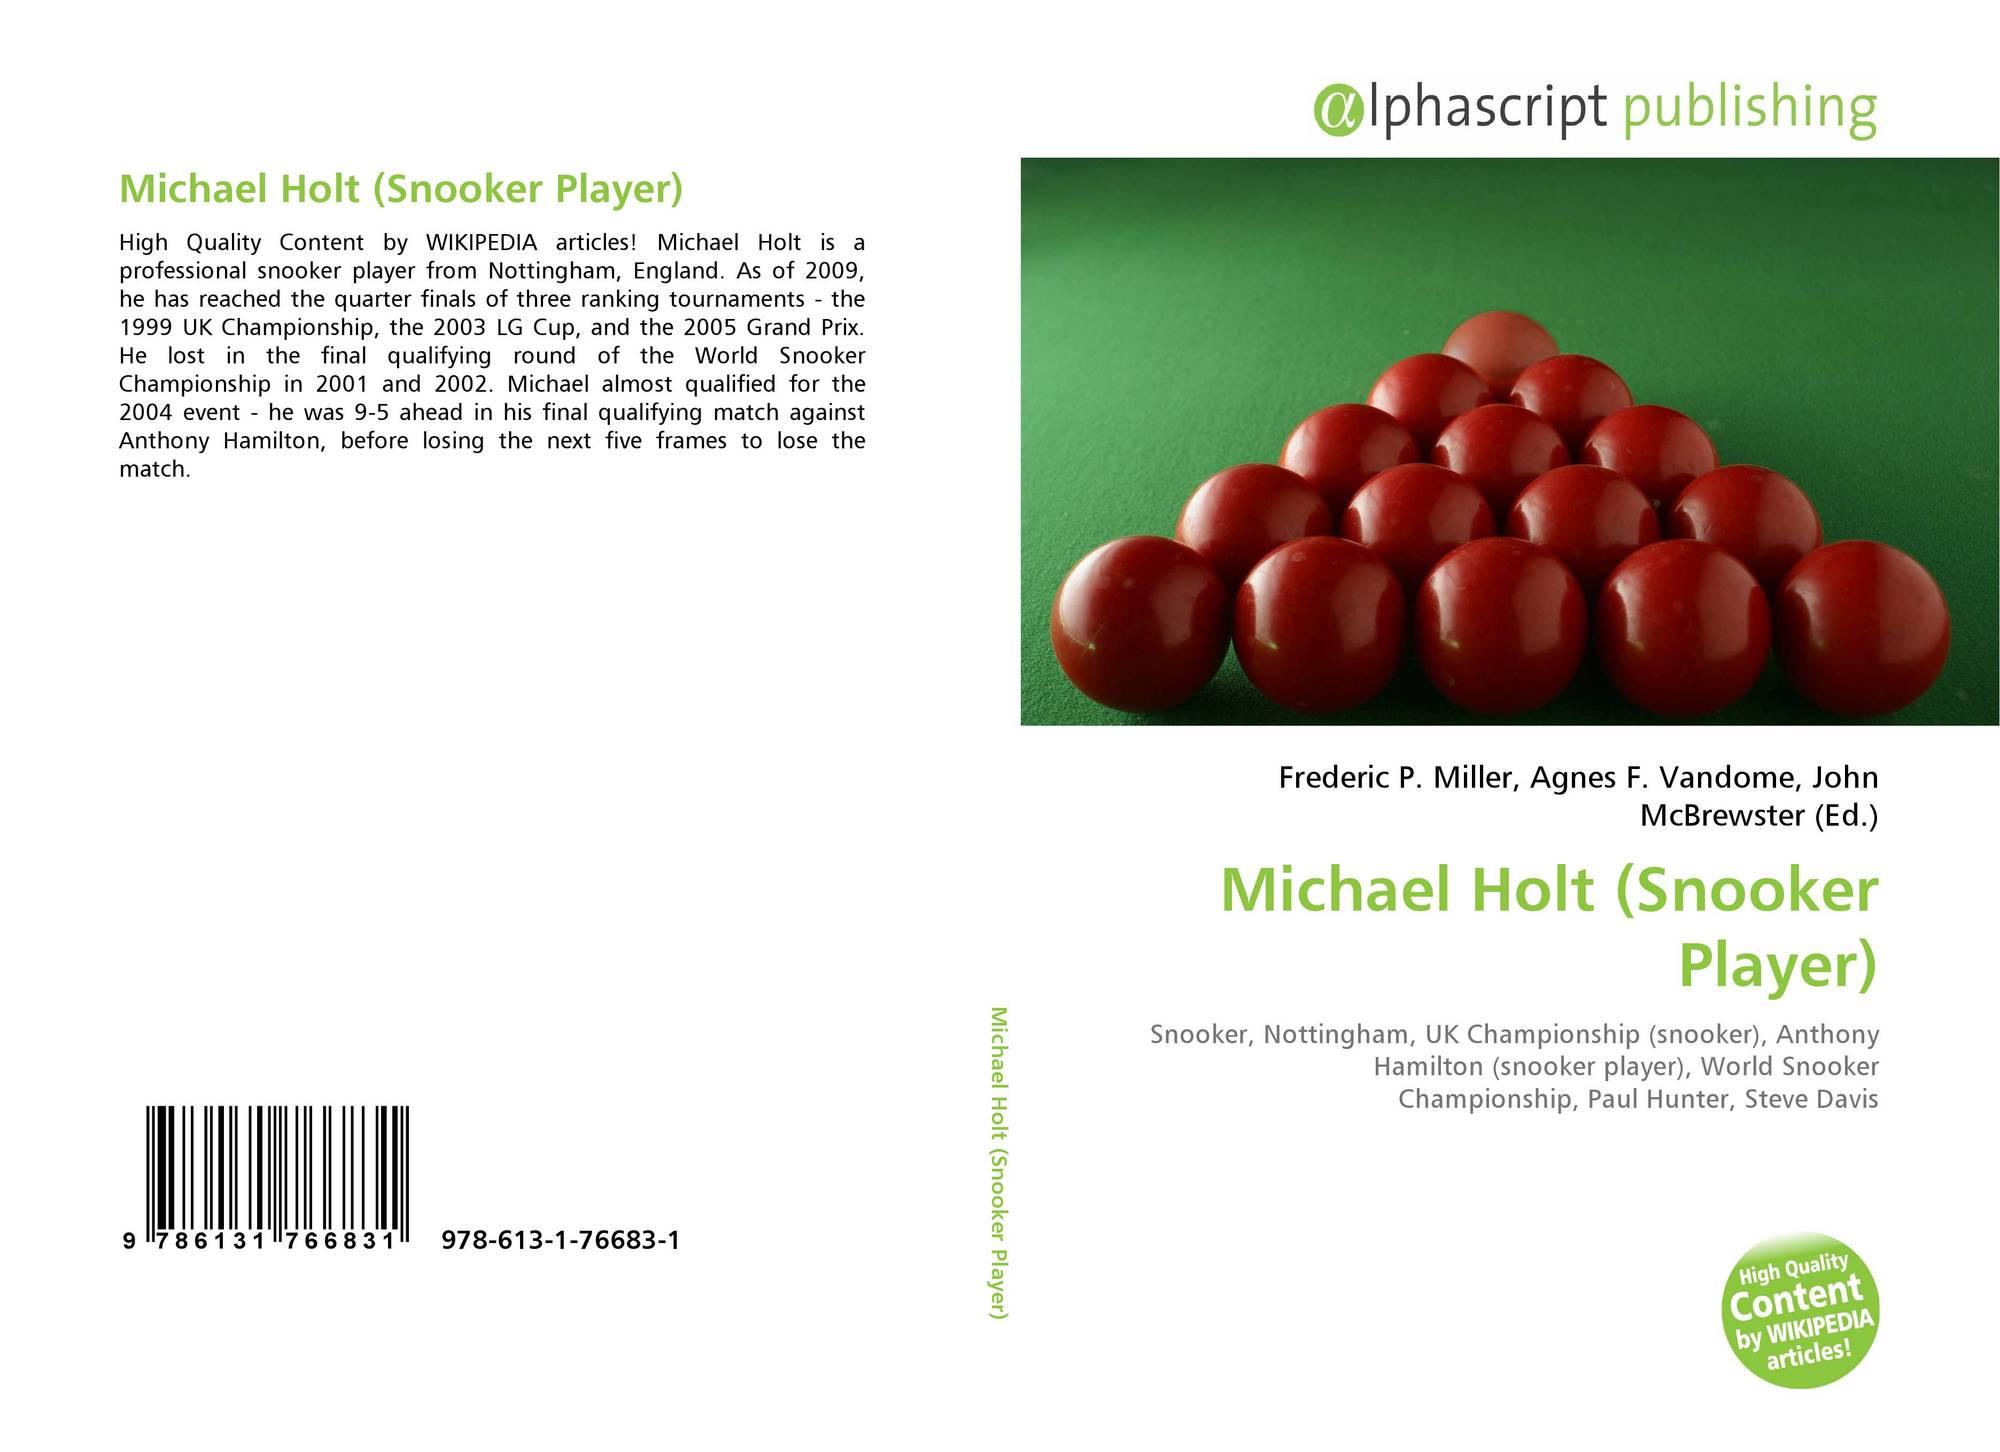 Michael Holt (Snooker Player), 978-613-1-76683-1, 6131766835 ...